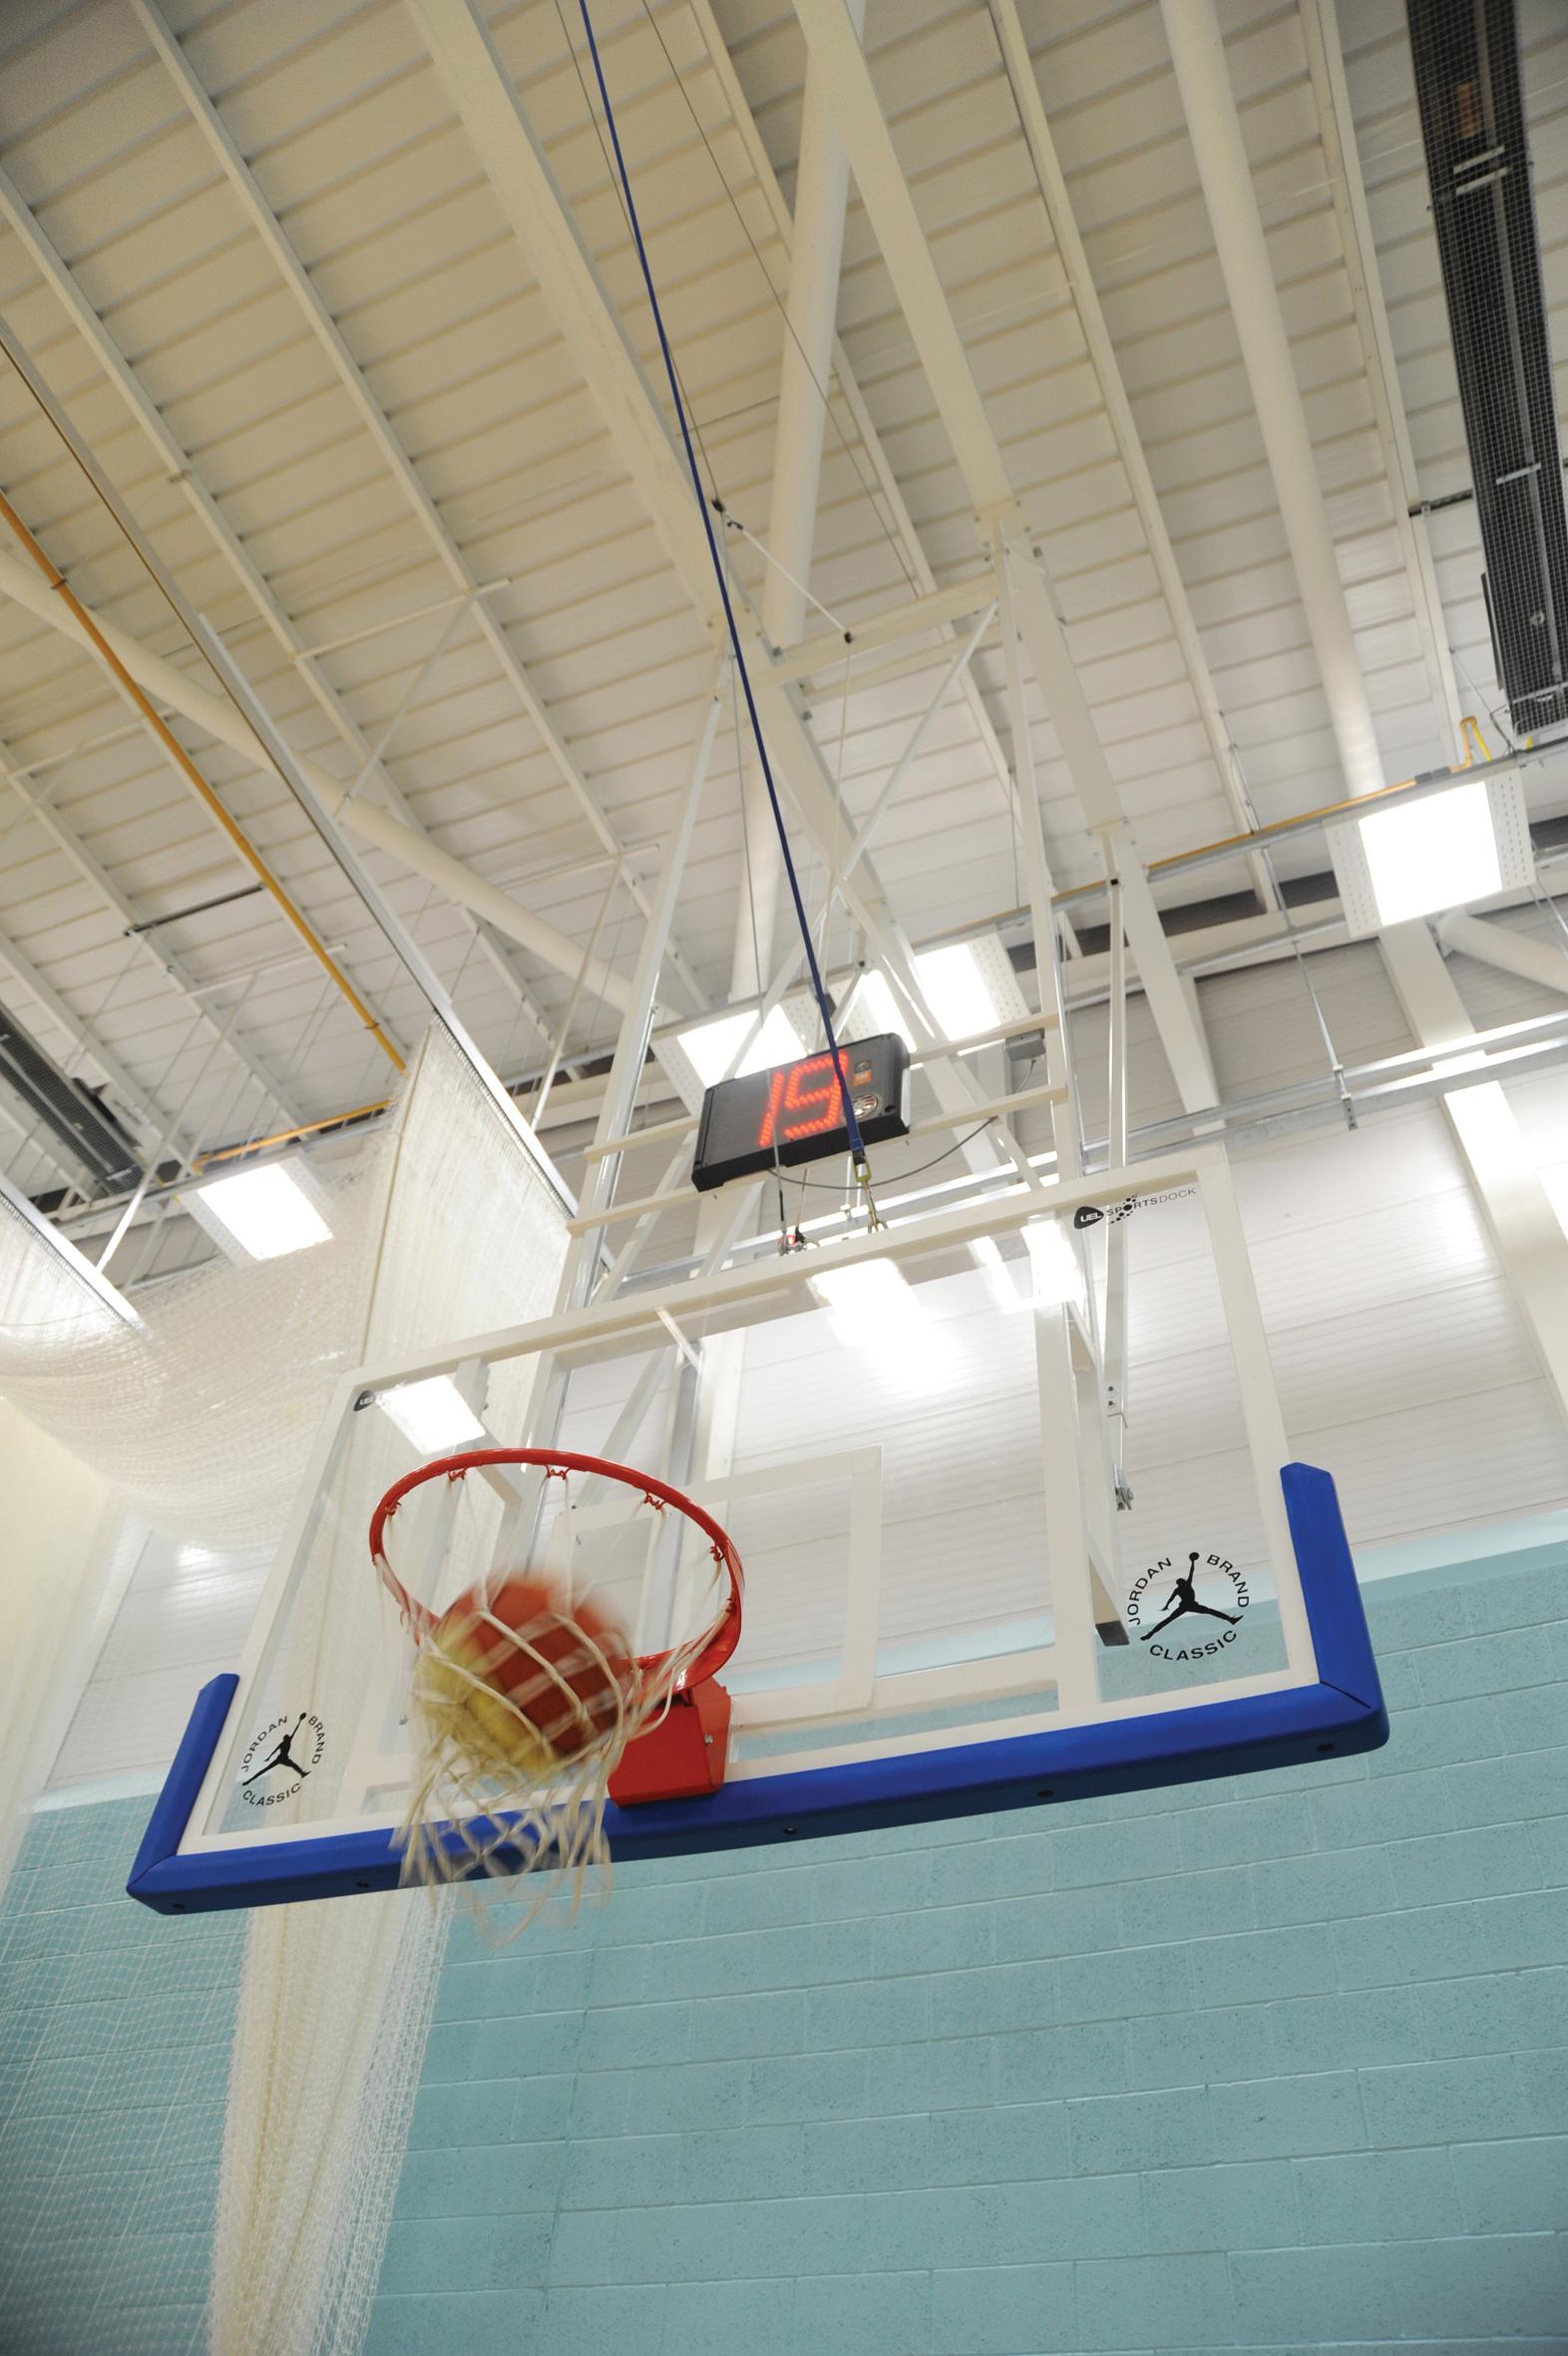 Clear Acrylic Basketball Backboards - (1800mm x 1050mm x 20mm)